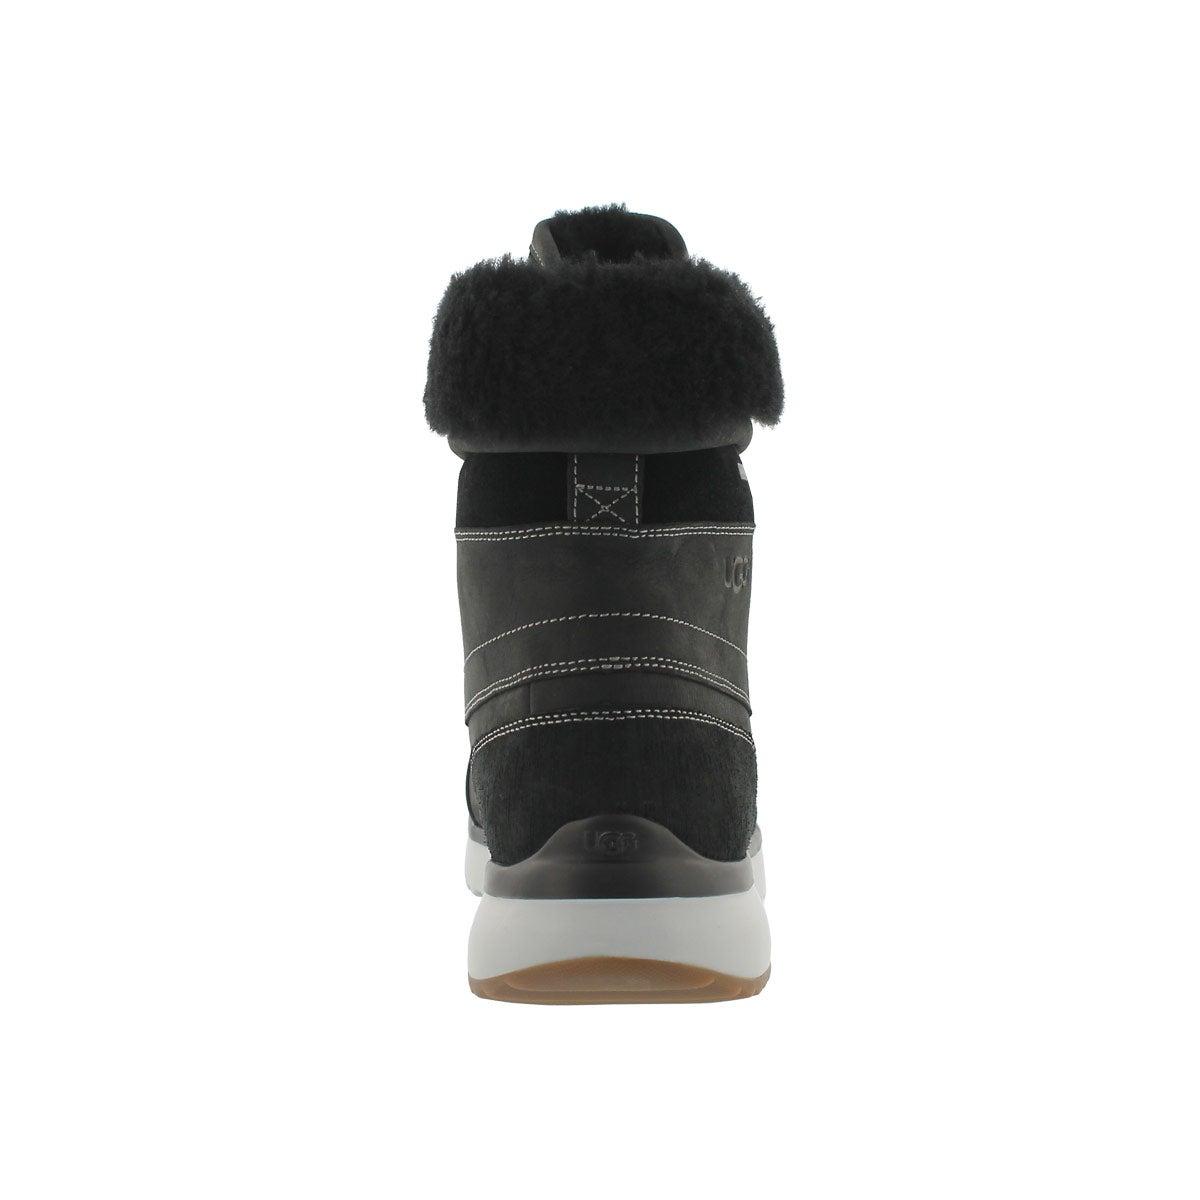 Mns Eliasson black lace up winter boot